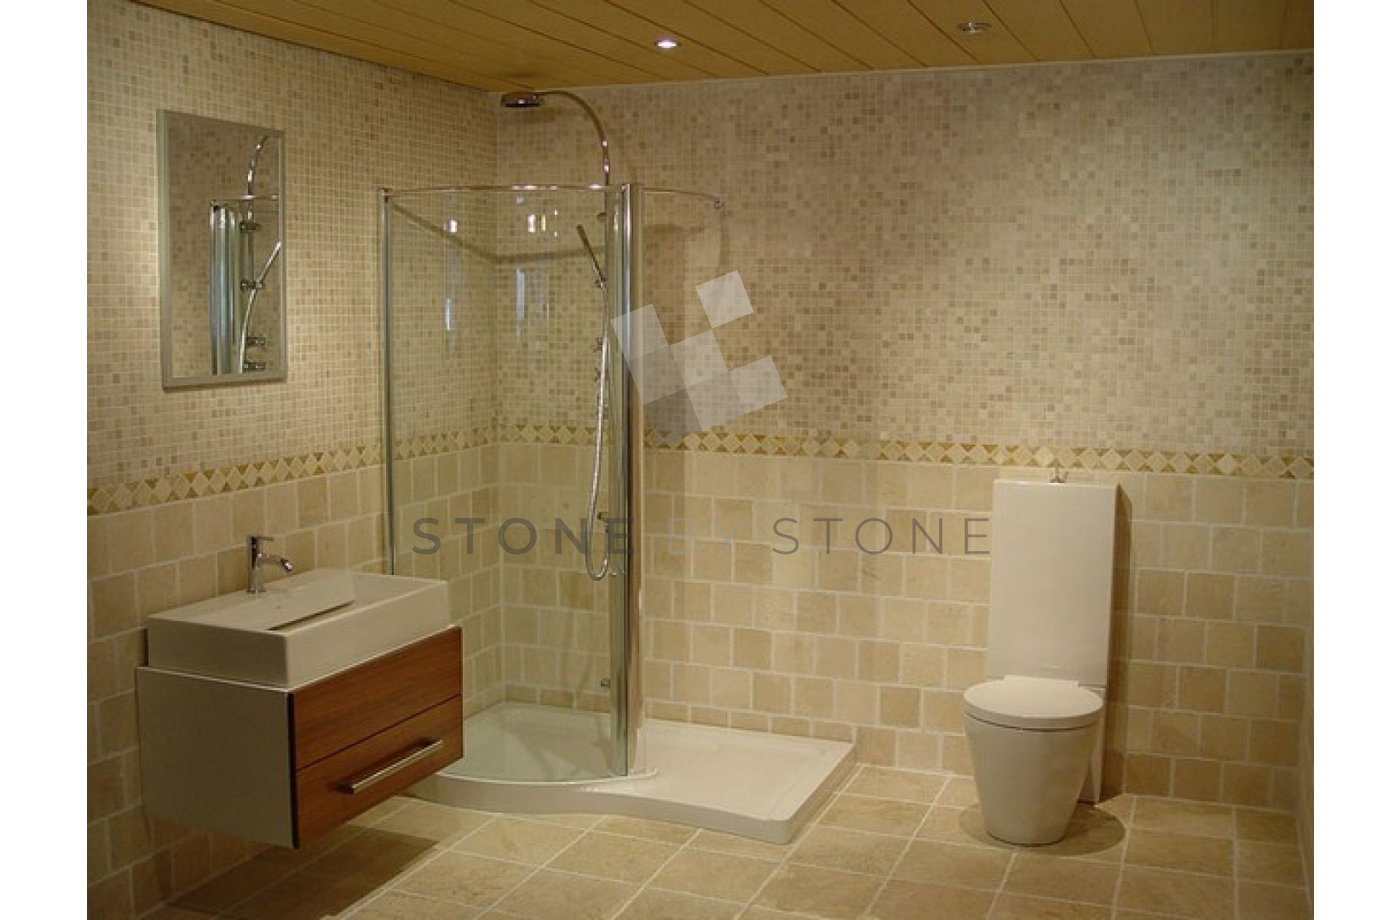 entretien parquet teck salle de bain gallery of sol teck salle de bain sol sol en entretien. Black Bedroom Furniture Sets. Home Design Ideas